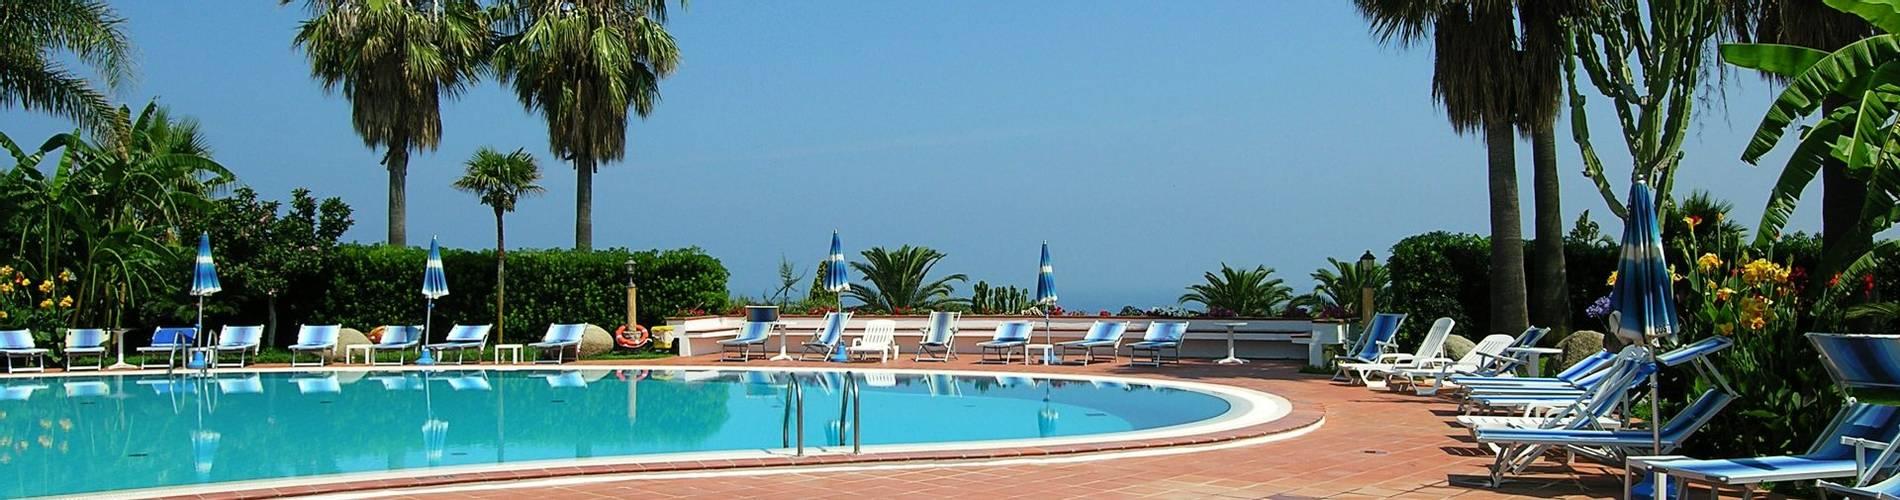 Costa Azzurra, Calabria, Italy (12).JPG